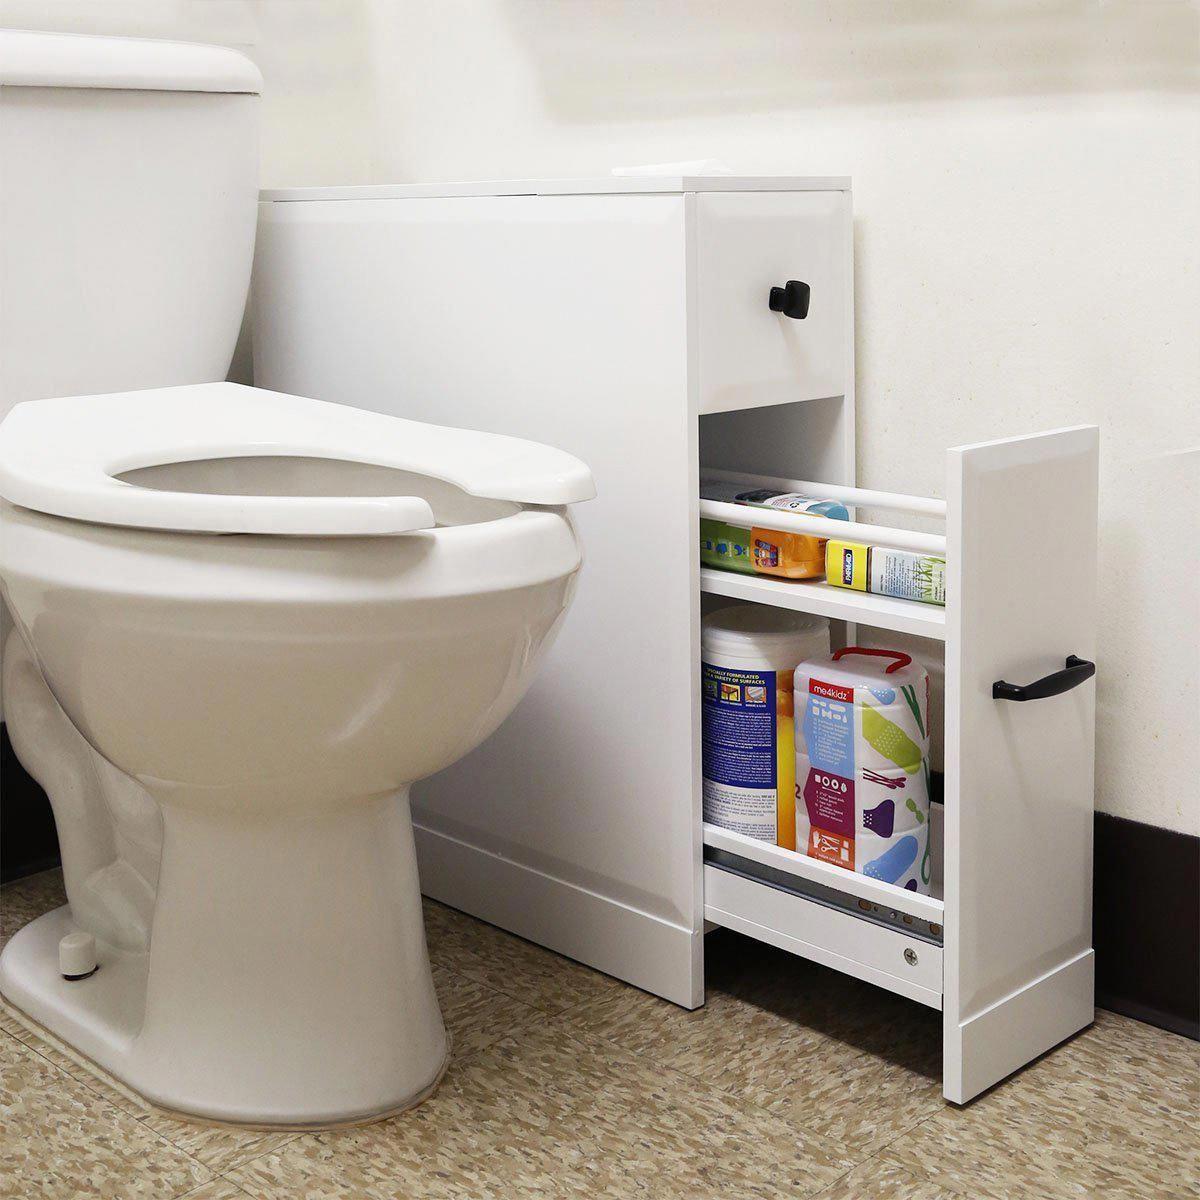 The SlideOut Bathroom Floor with a narrow